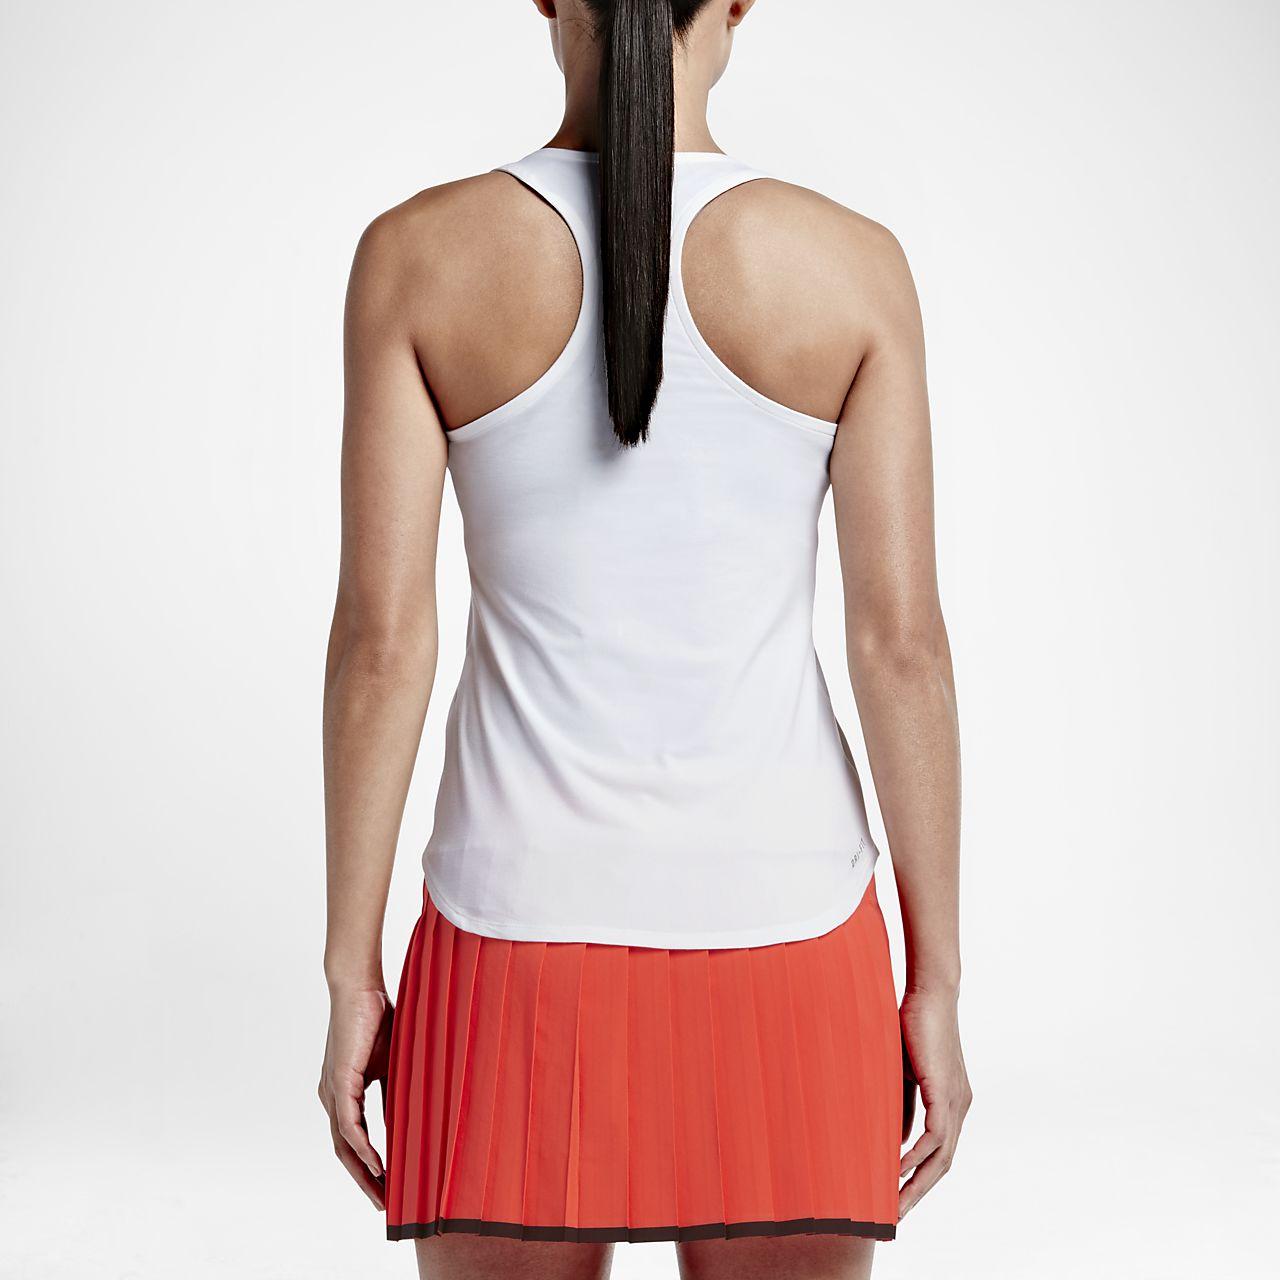 372b5280edbf5 NikeCourt Team Pure Women s Tennis Tank Top. Nike.com EG